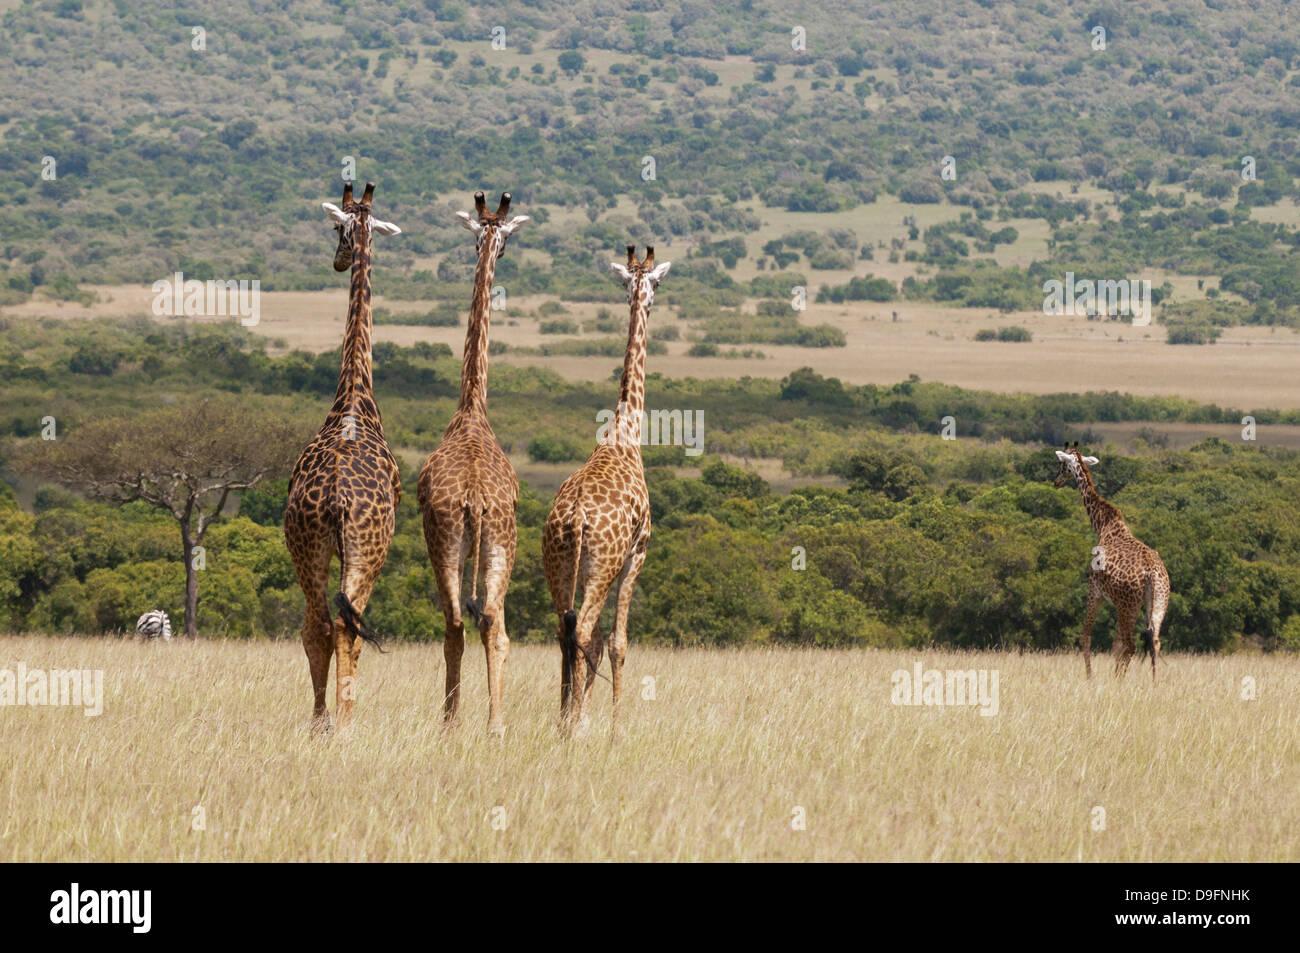 Masai giraffe (Giraffa camelopardalis), il Masai Mara riserva nazionale, Kenya, Africa orientale, Africa Immagini Stock